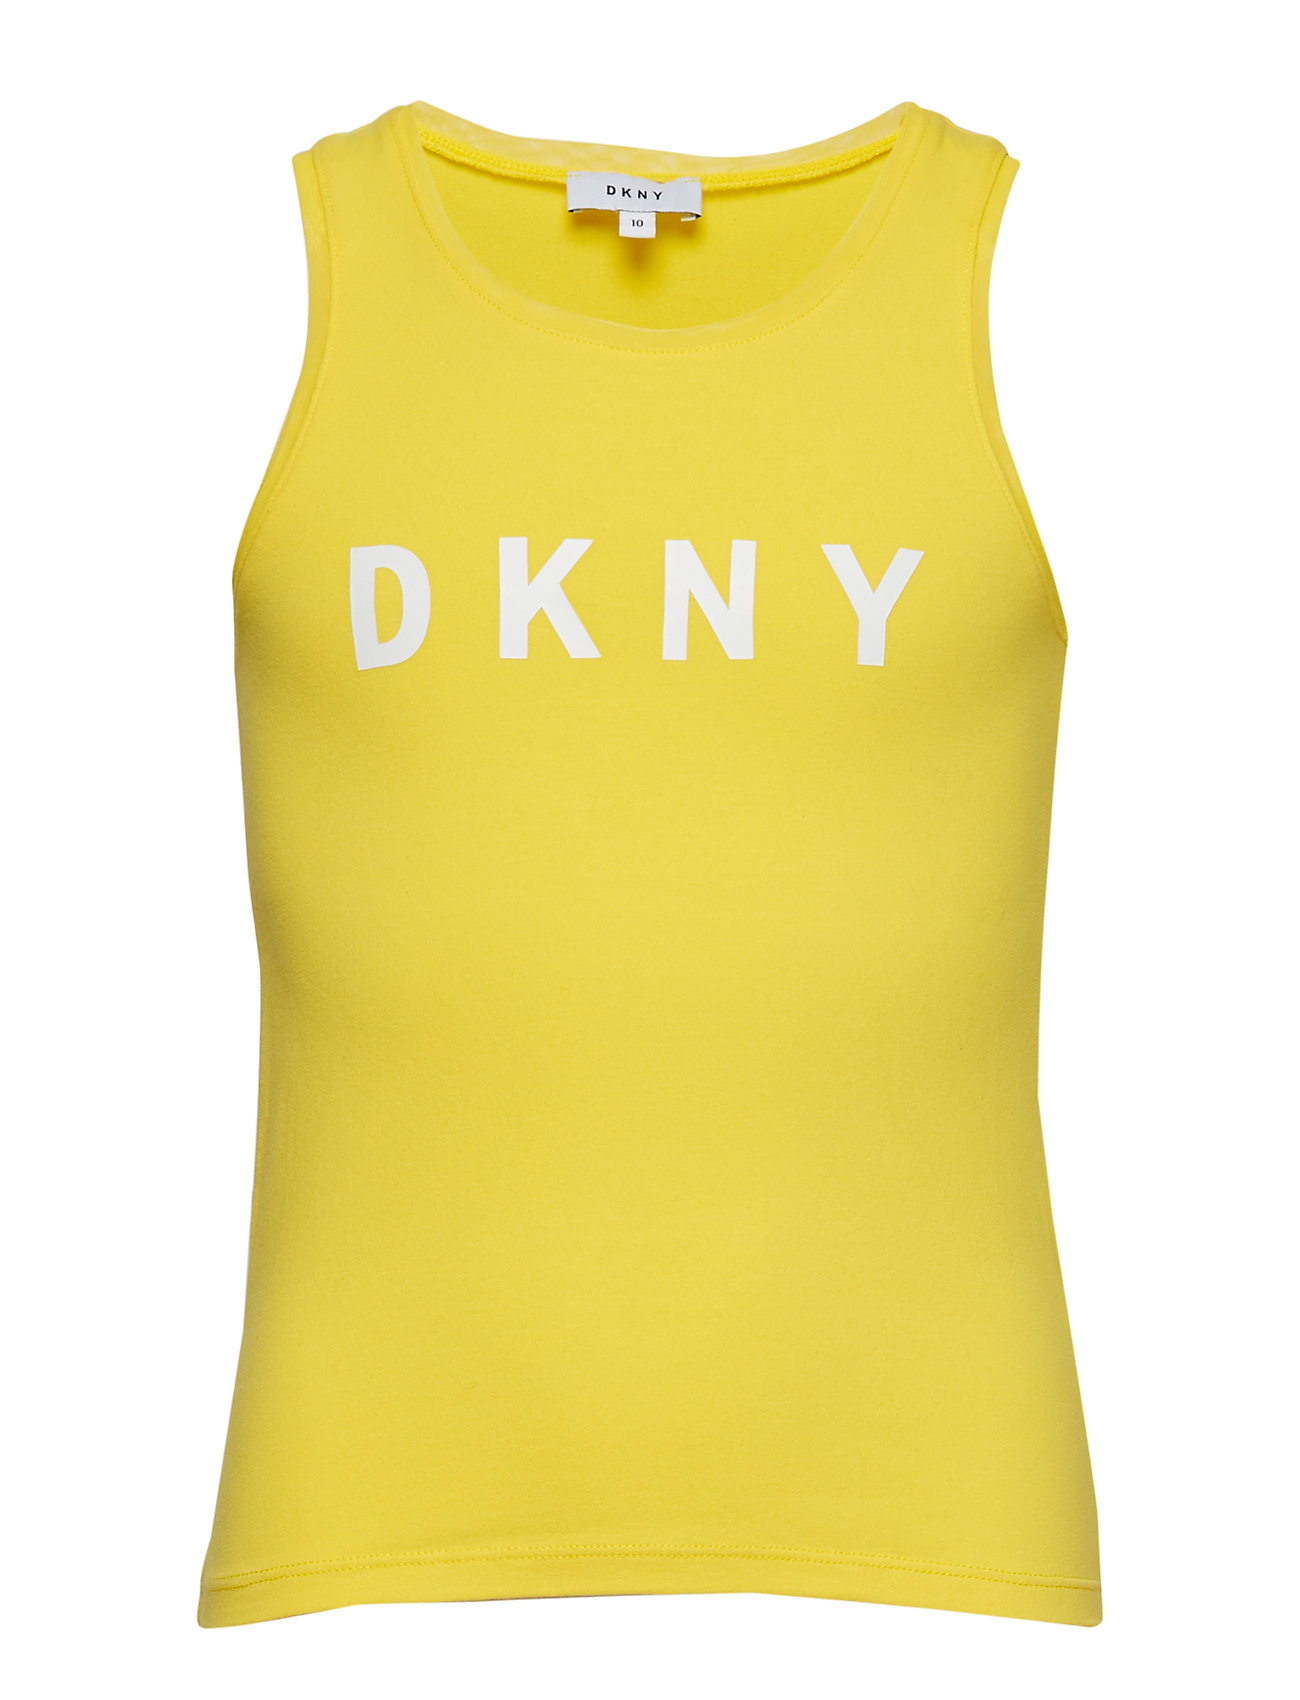 DKNY kids TANK TOP - YELLOW